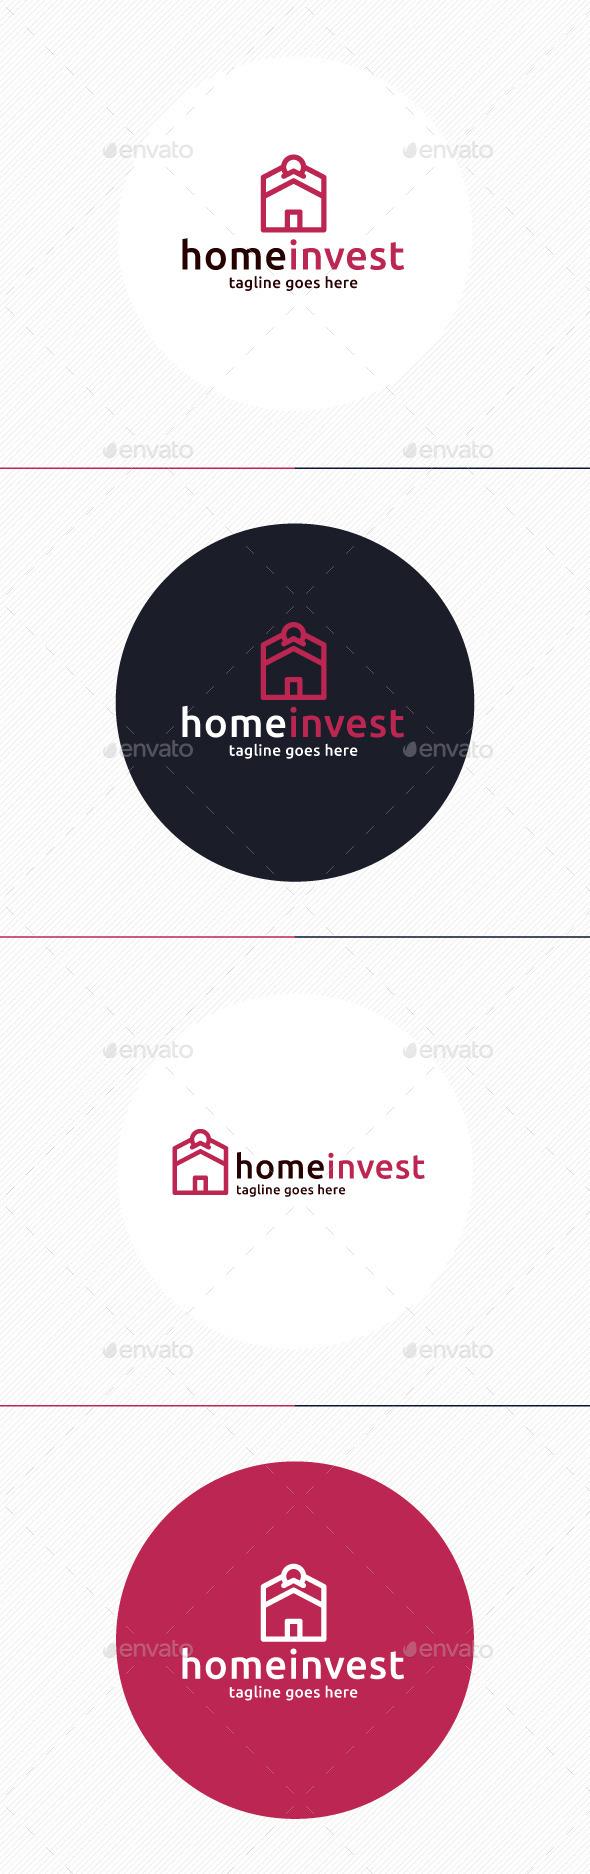 GraphicRiver Home Invest Logo 9737264